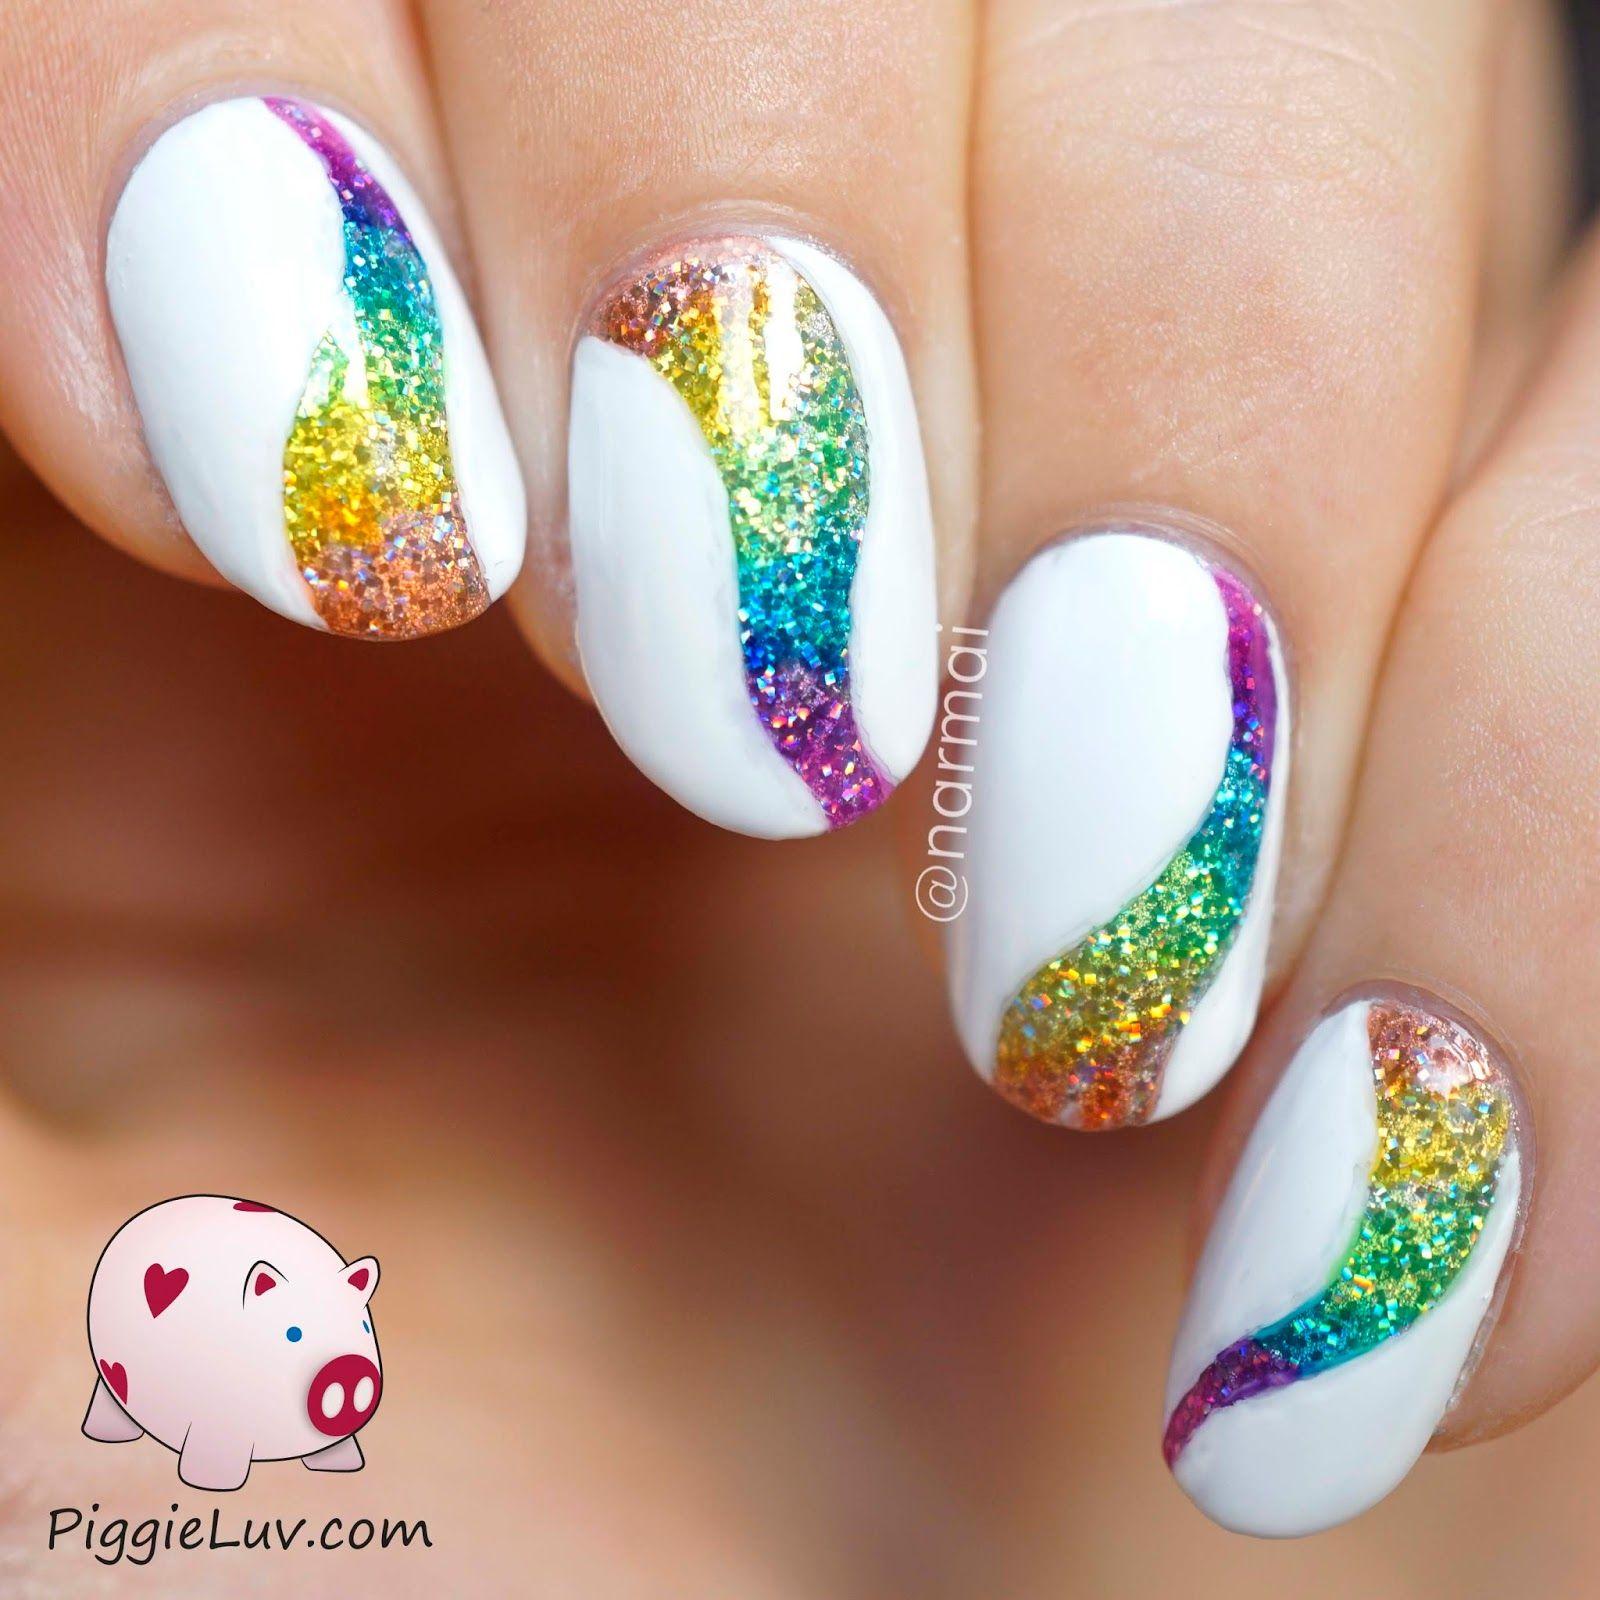 Glitter tornado nail art with OPI Color Paints | Pinterest | Color ...